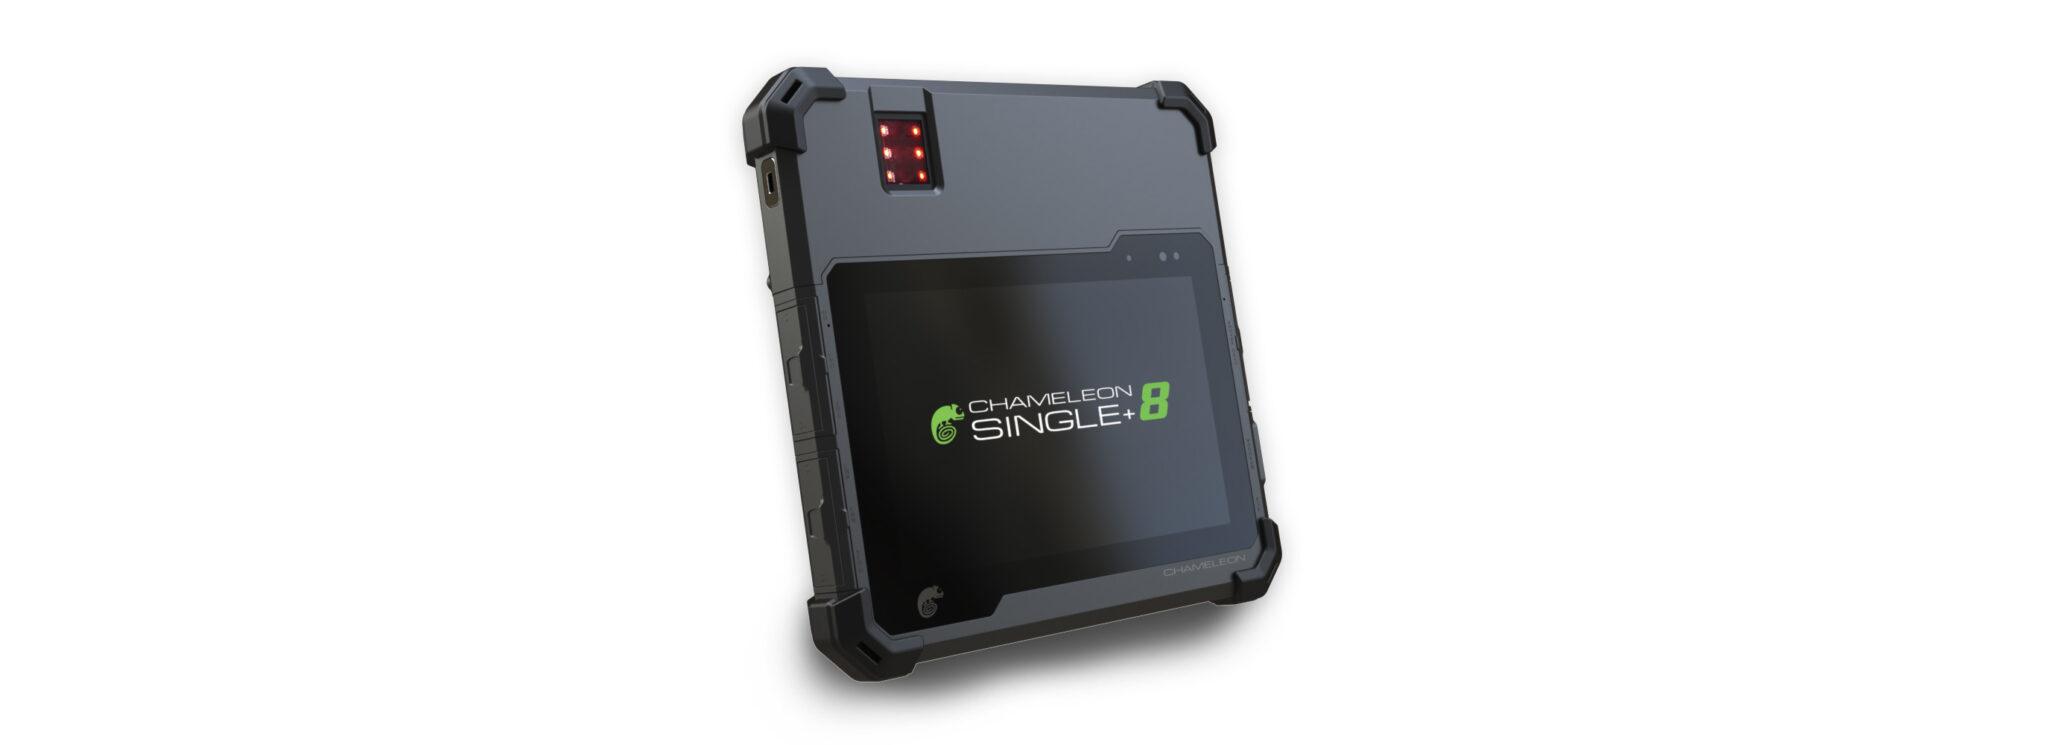 suprema biometric sensor laxton chameleon